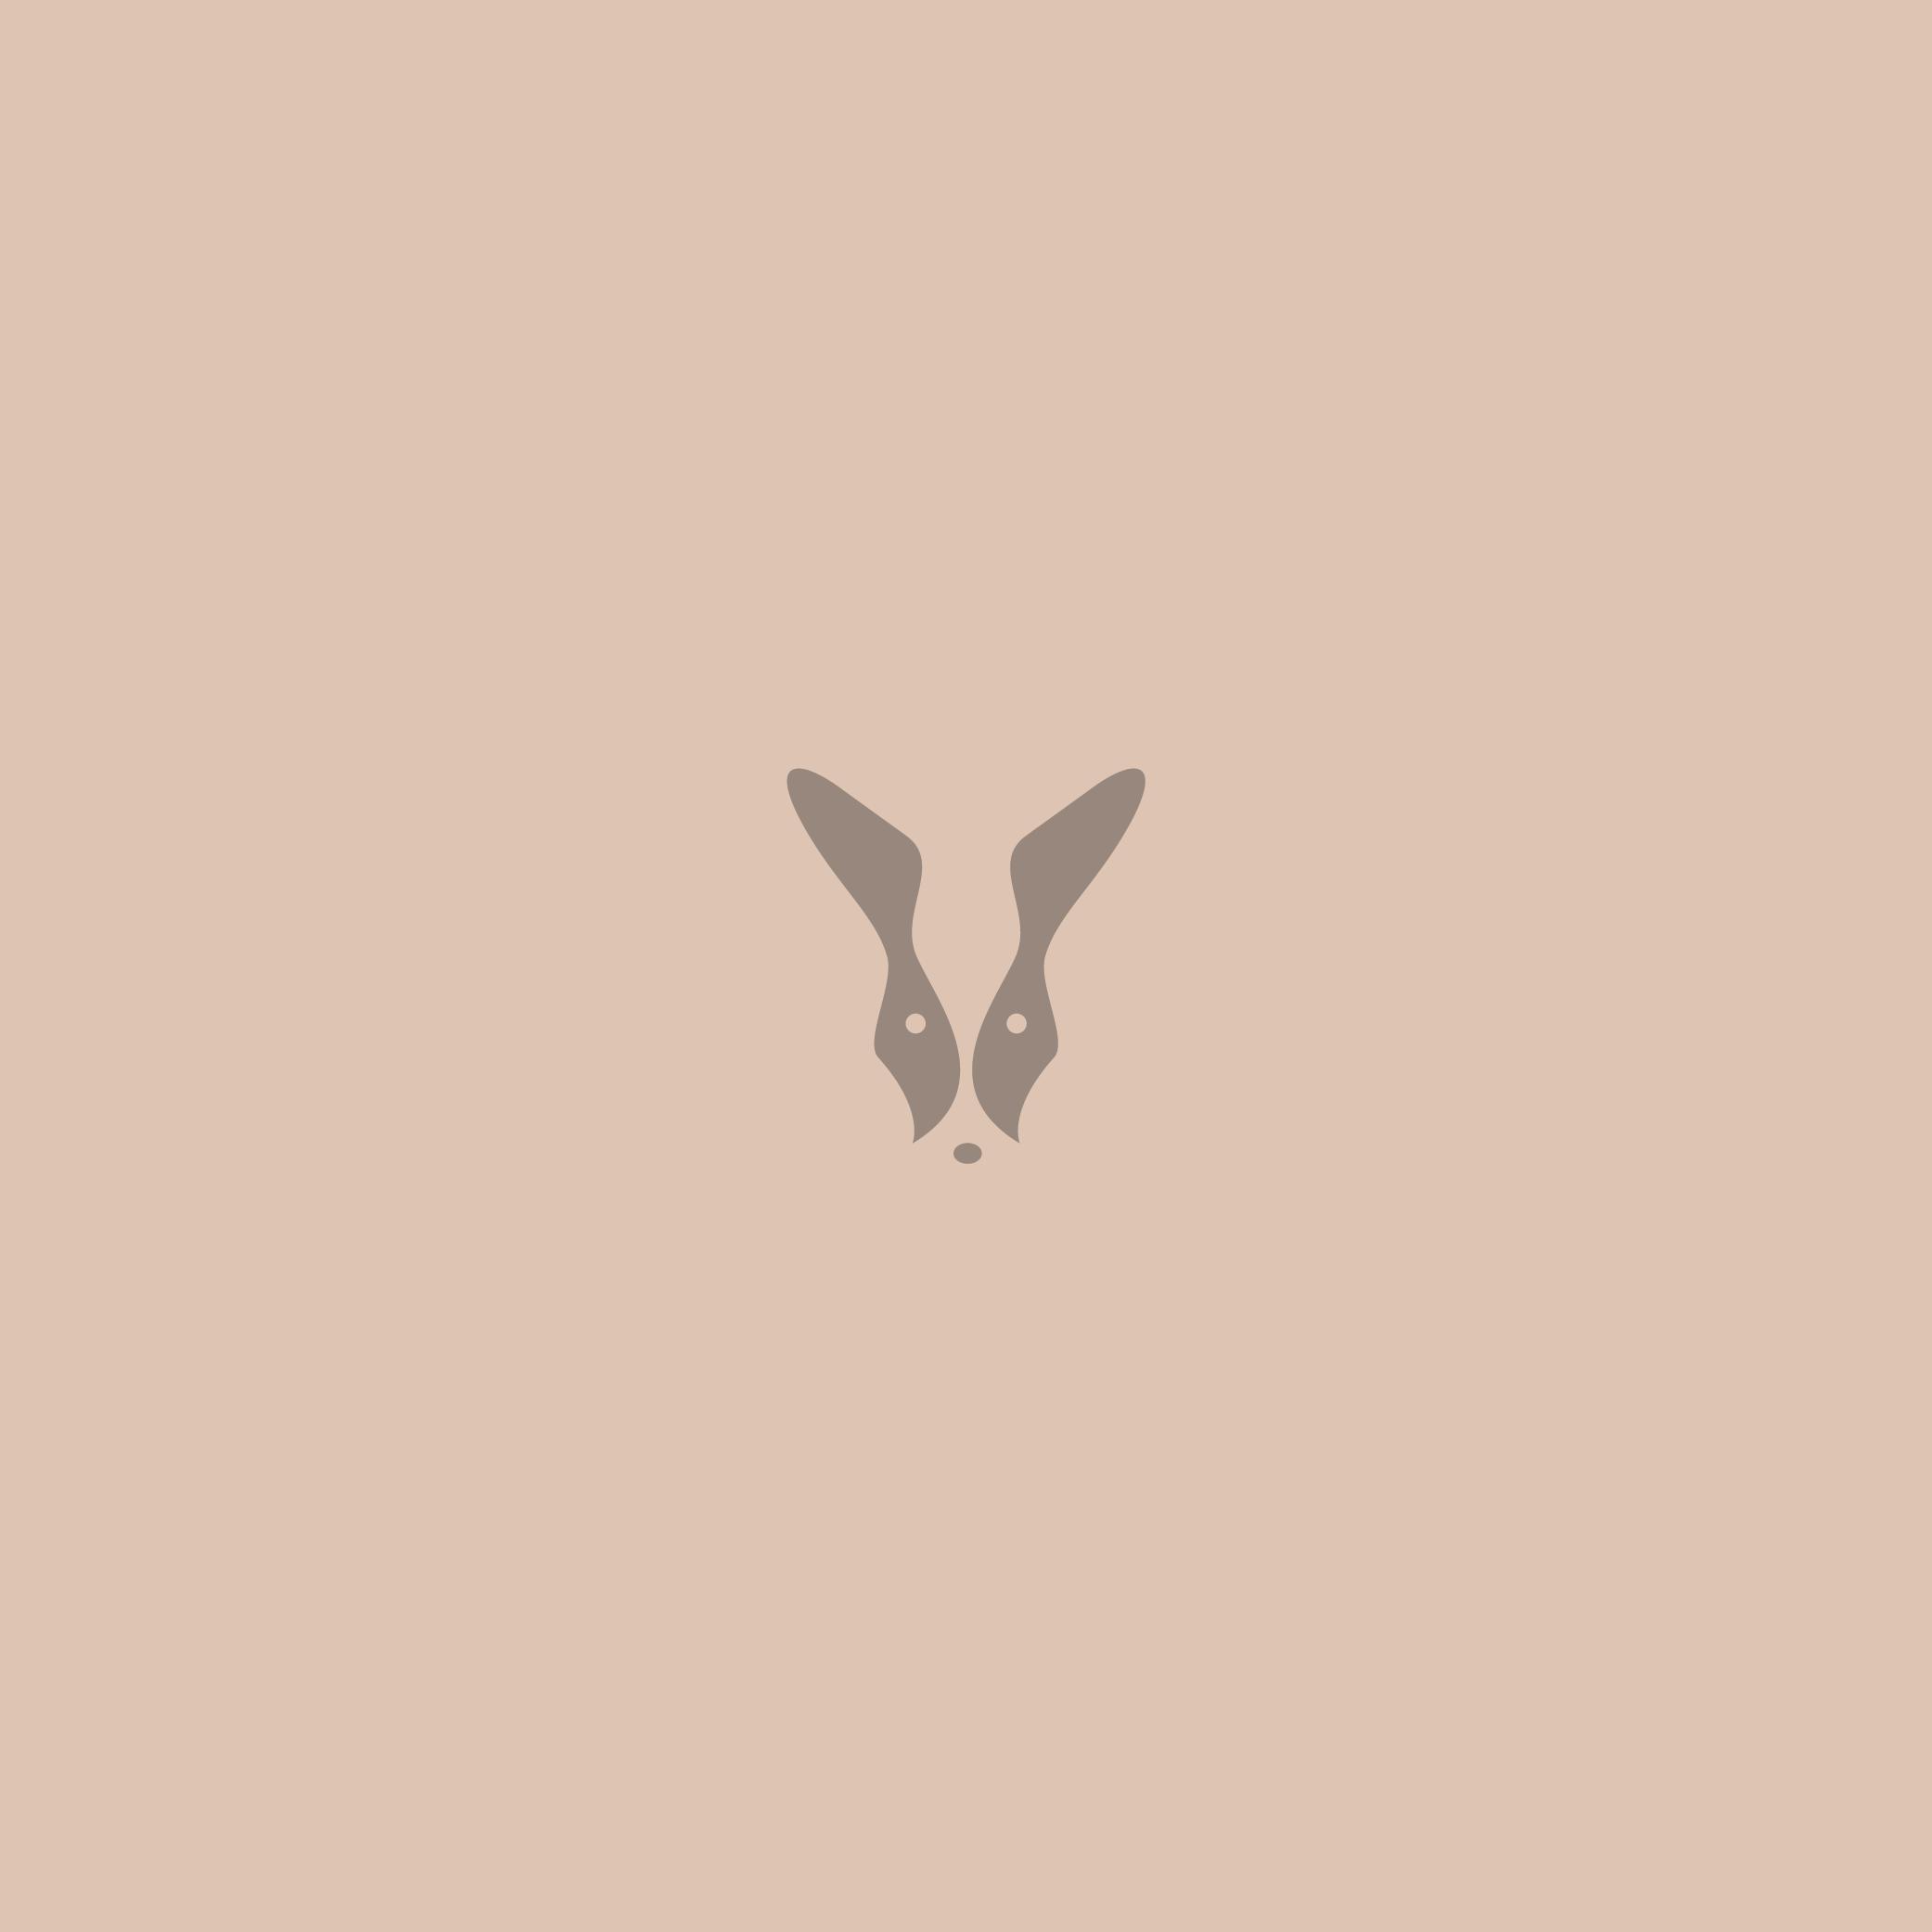 Wallaby-01.png